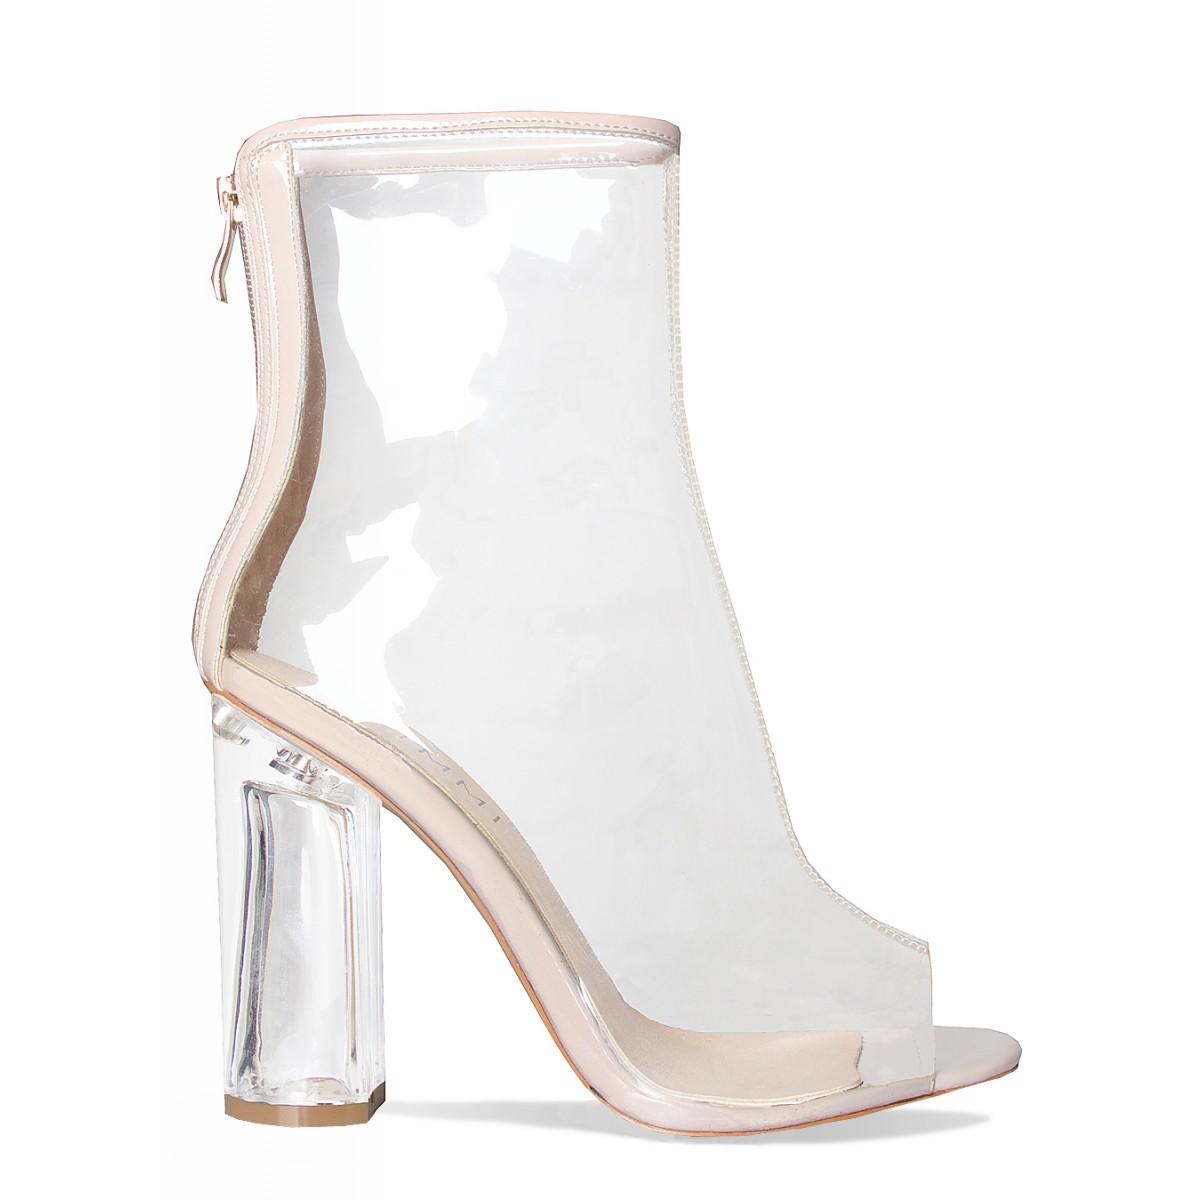 60dd639d5da Melissa Nude Peep Toe Perspex Heel Ankle Boots   Simmi Shoes